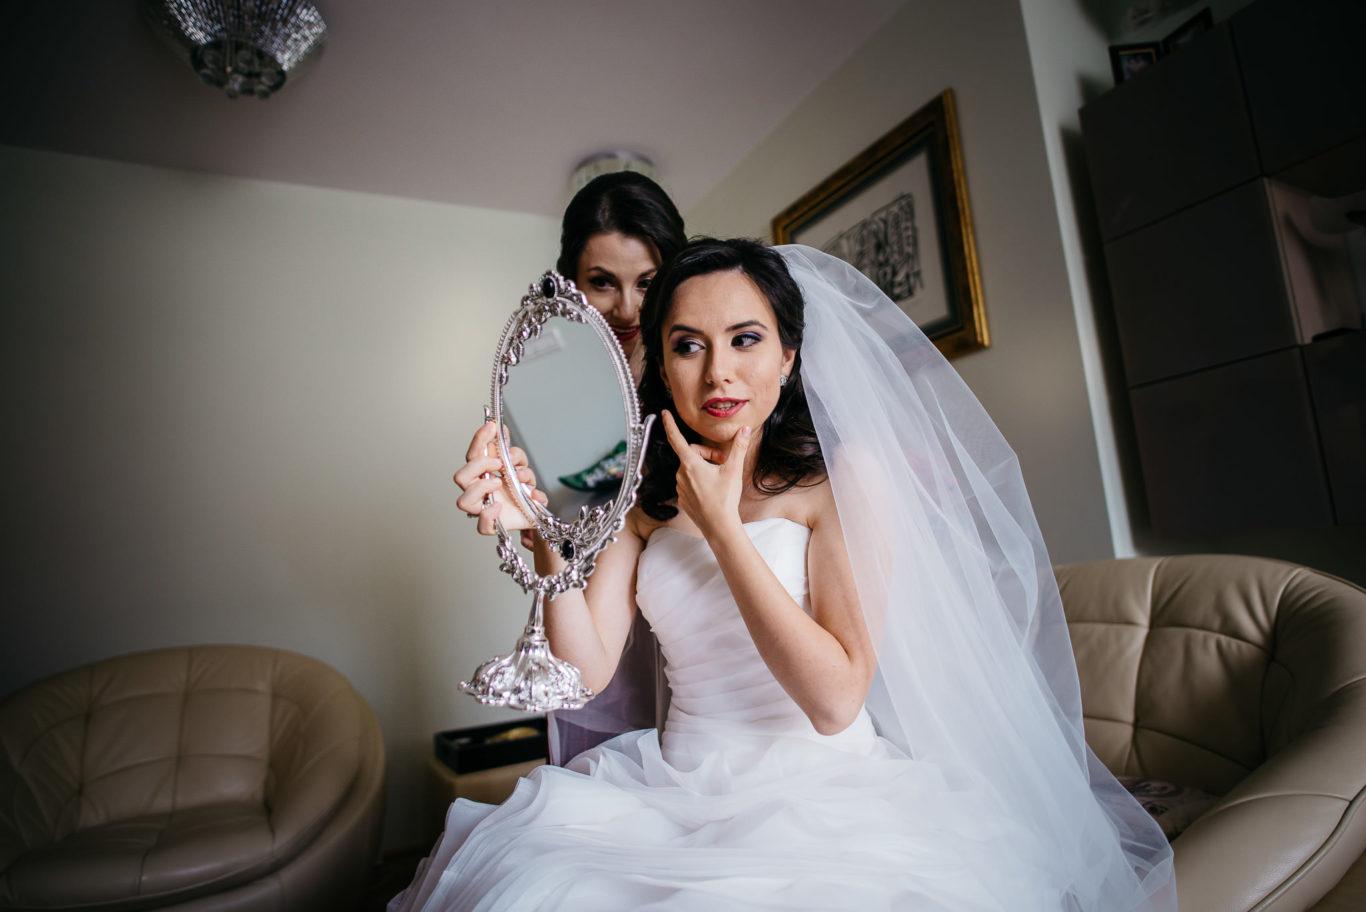 0251-Fotografie-nunta-Simona-Valentin-fotograf-Ciprian-Dumitrescu-DSC_1100